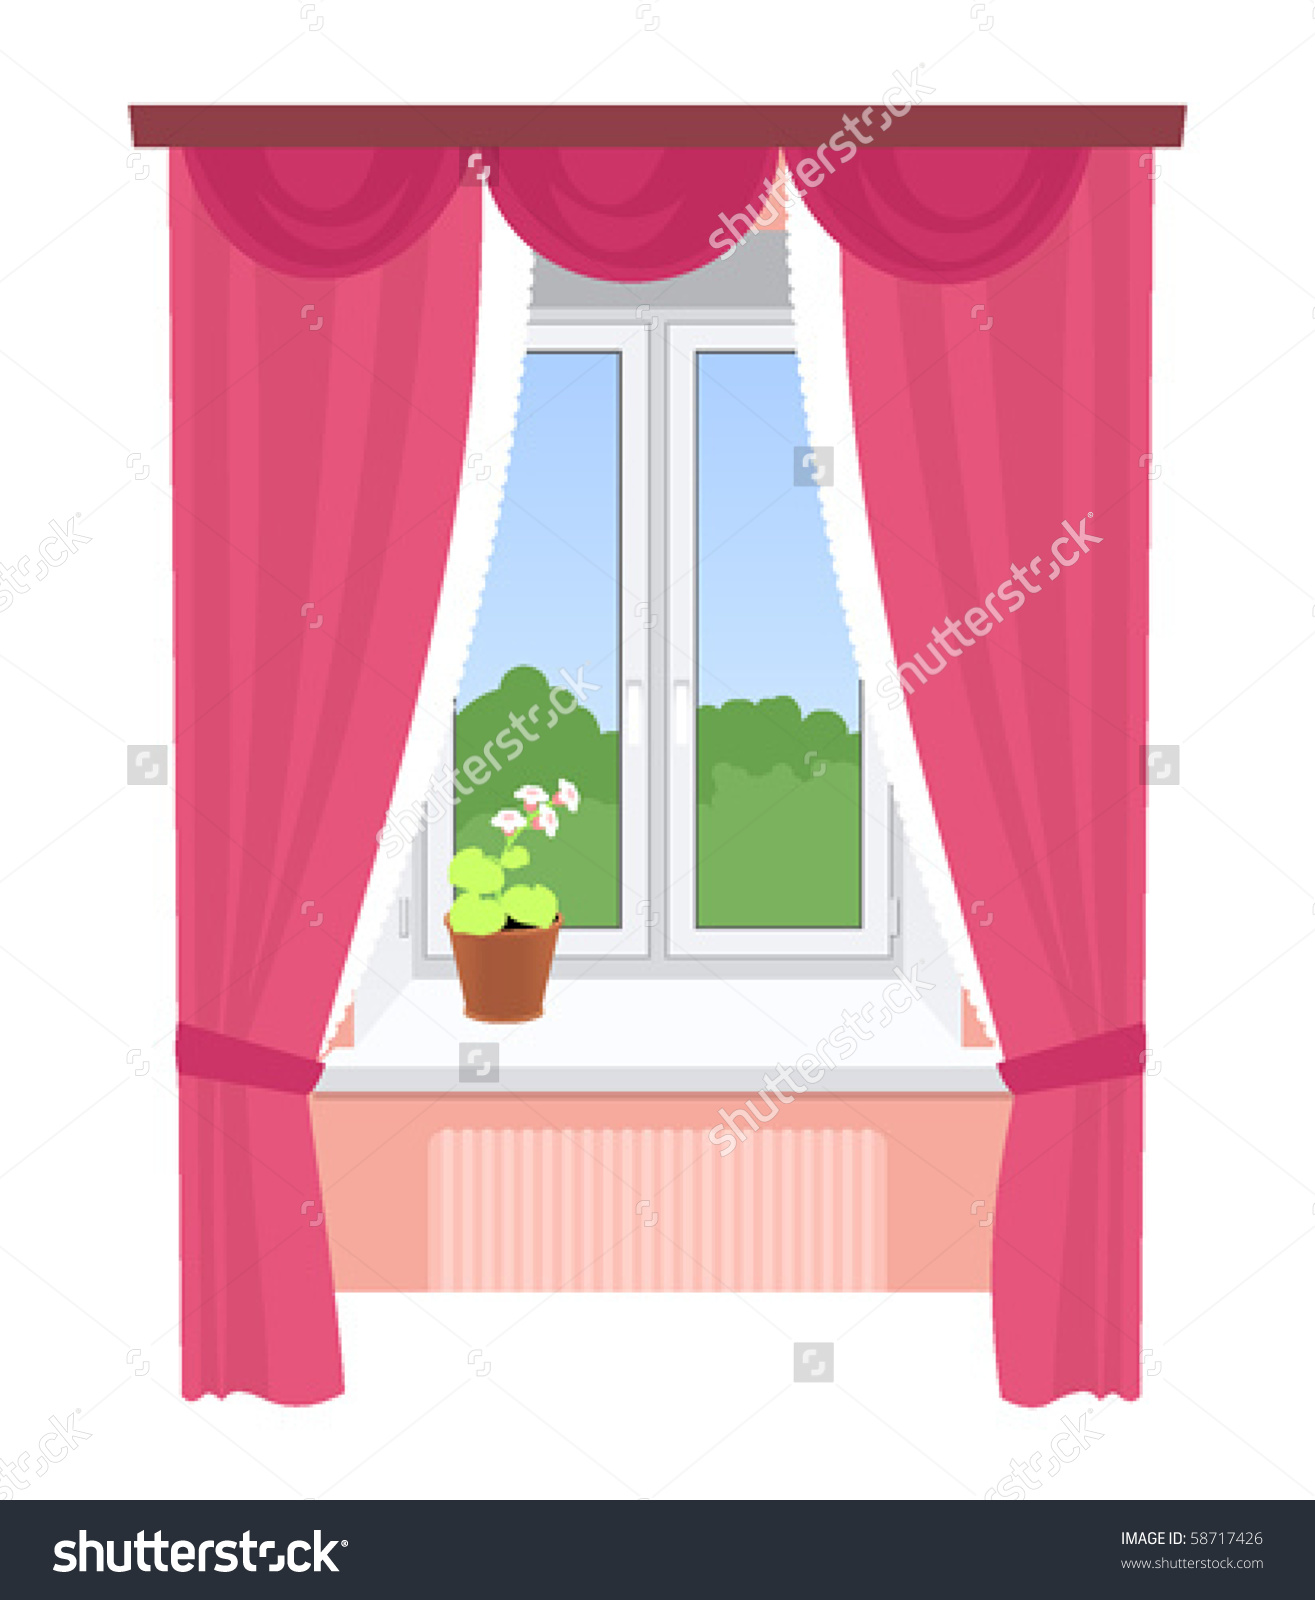 5876 Window free clipart.